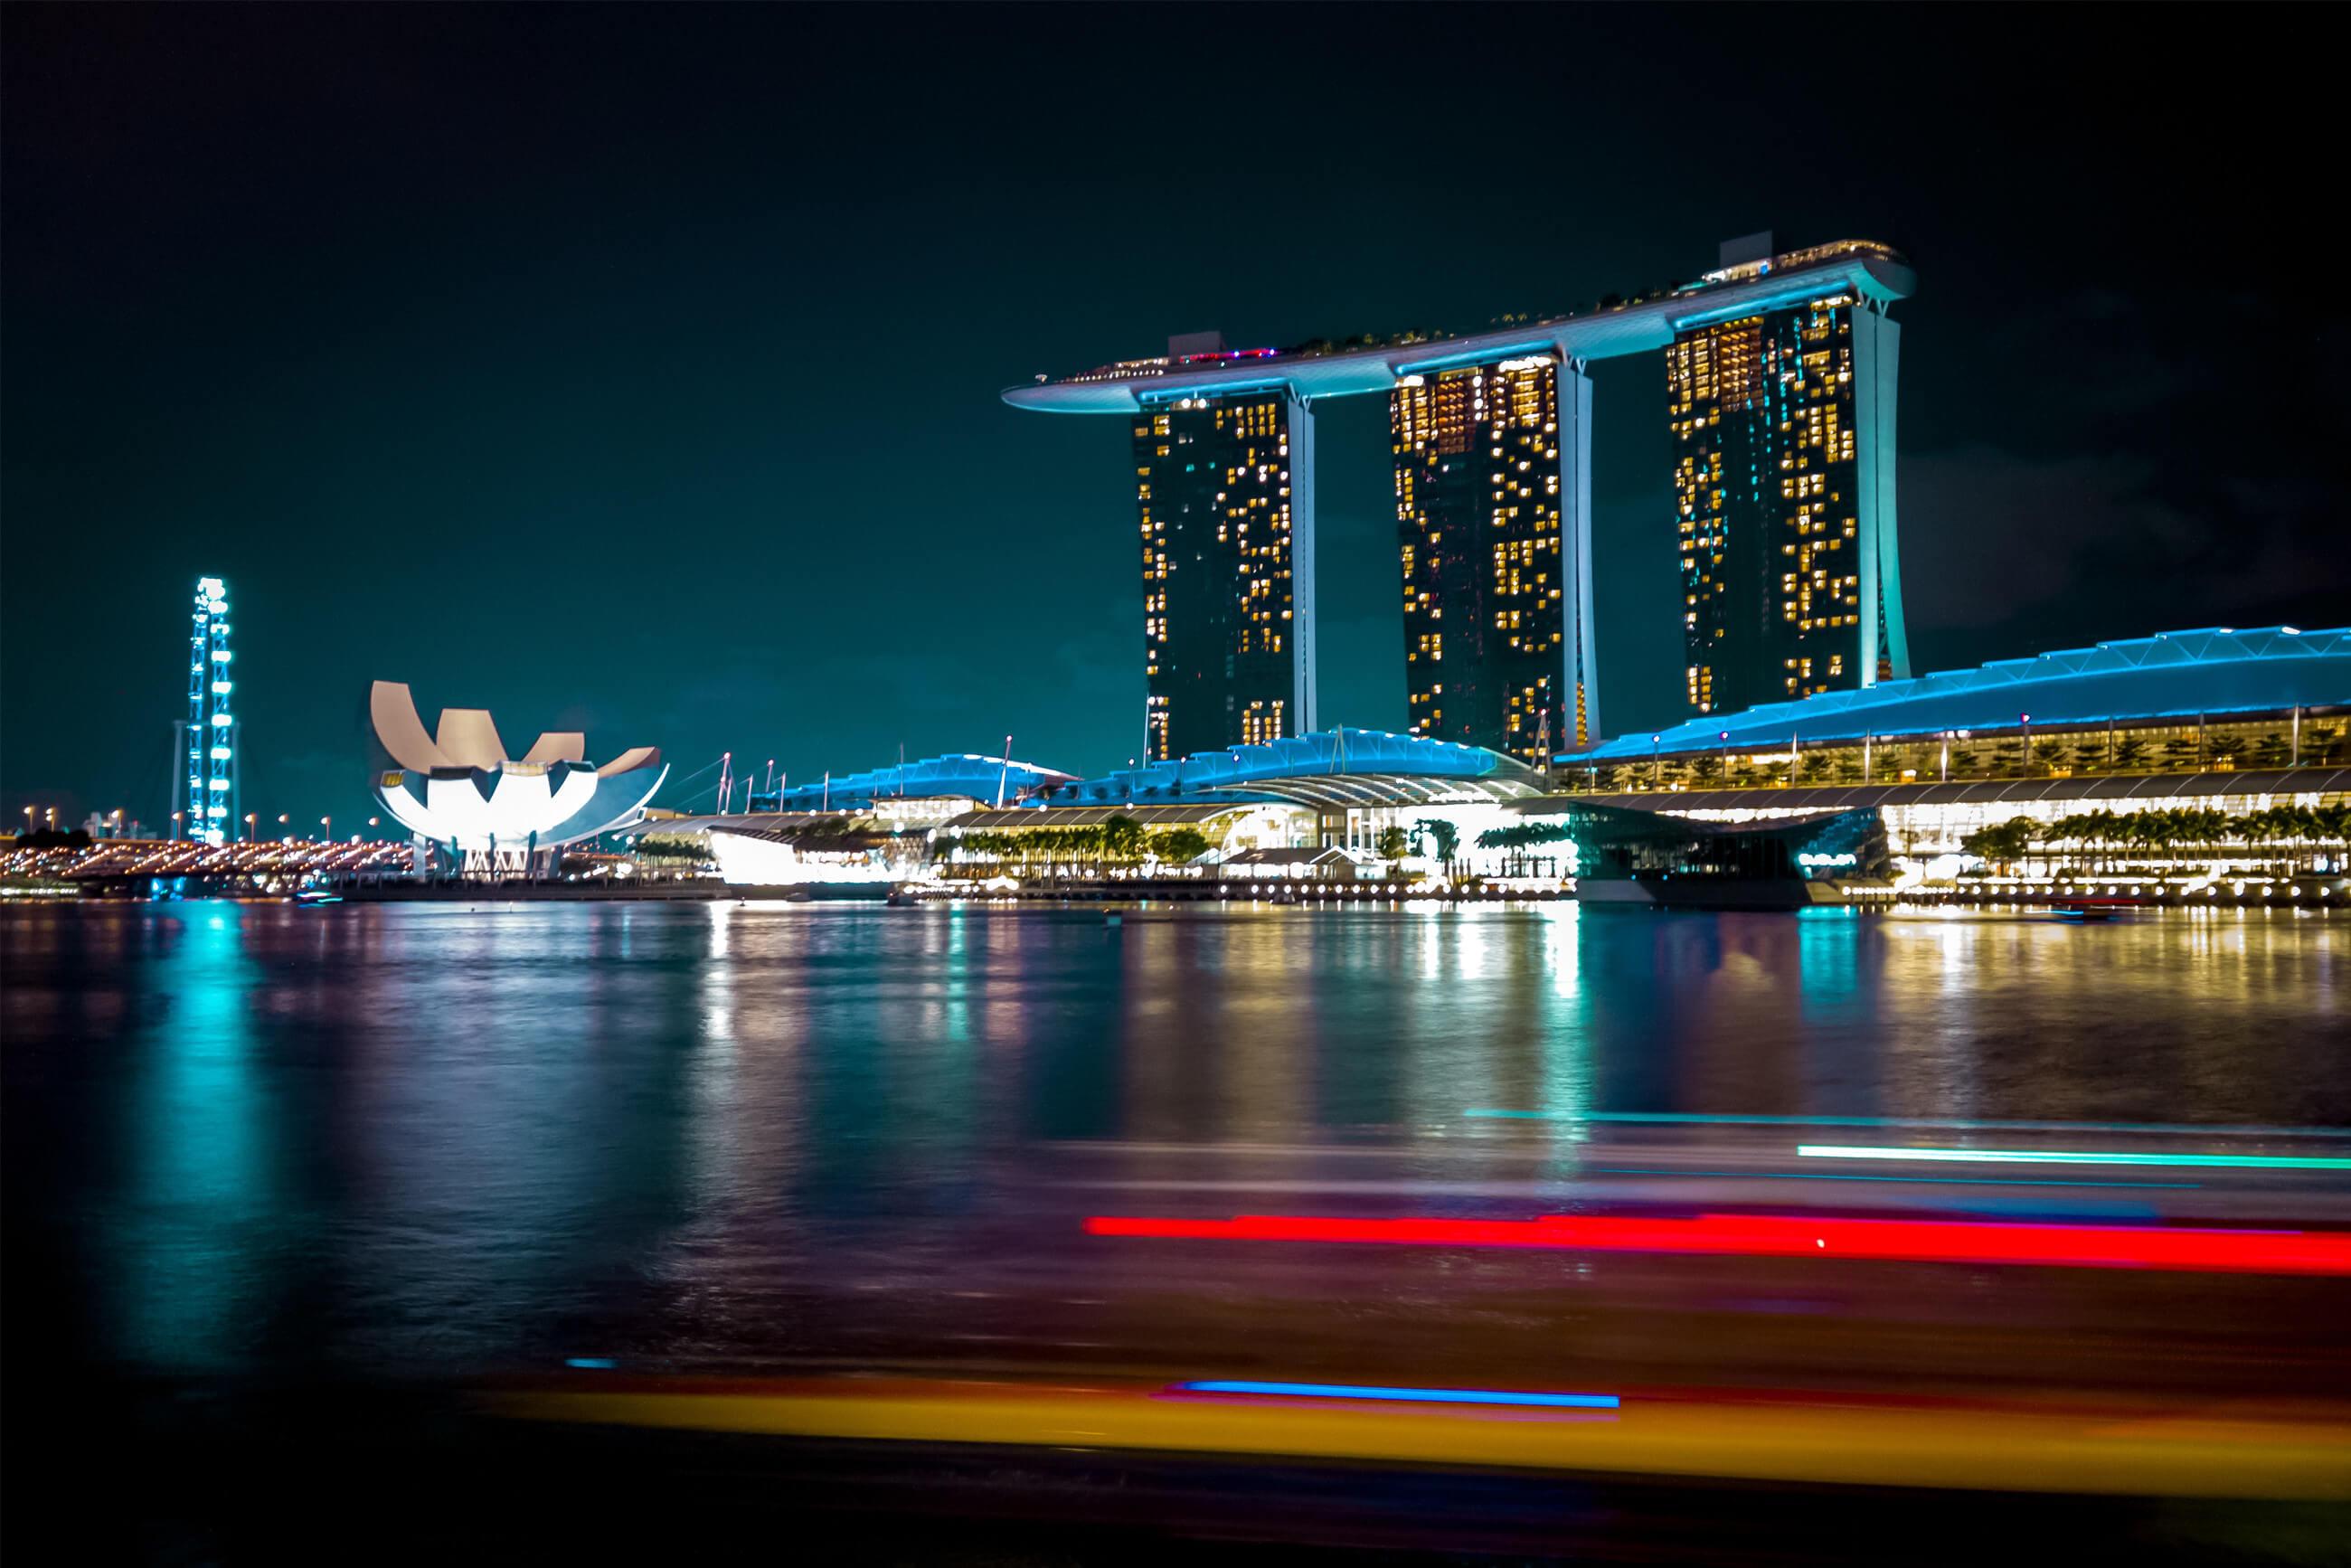 https://bubo.sk/uploads/galleries/7468/pixabay_singapore-430643.jpg